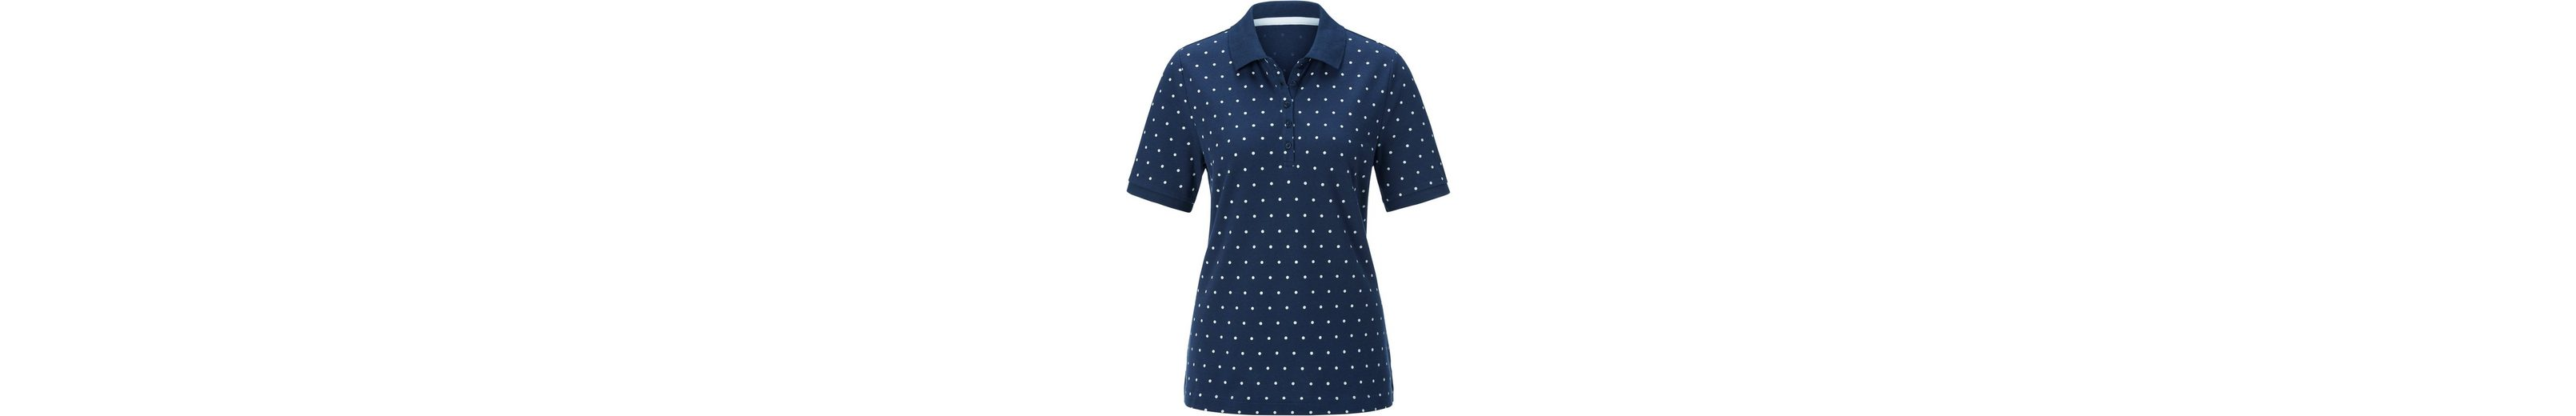 Classic Basics Poloshirt im Pünktchen-Dessin Rabatt Angebot Rabatt Sast Outlet Große Überraschung ZVS6cXbwF